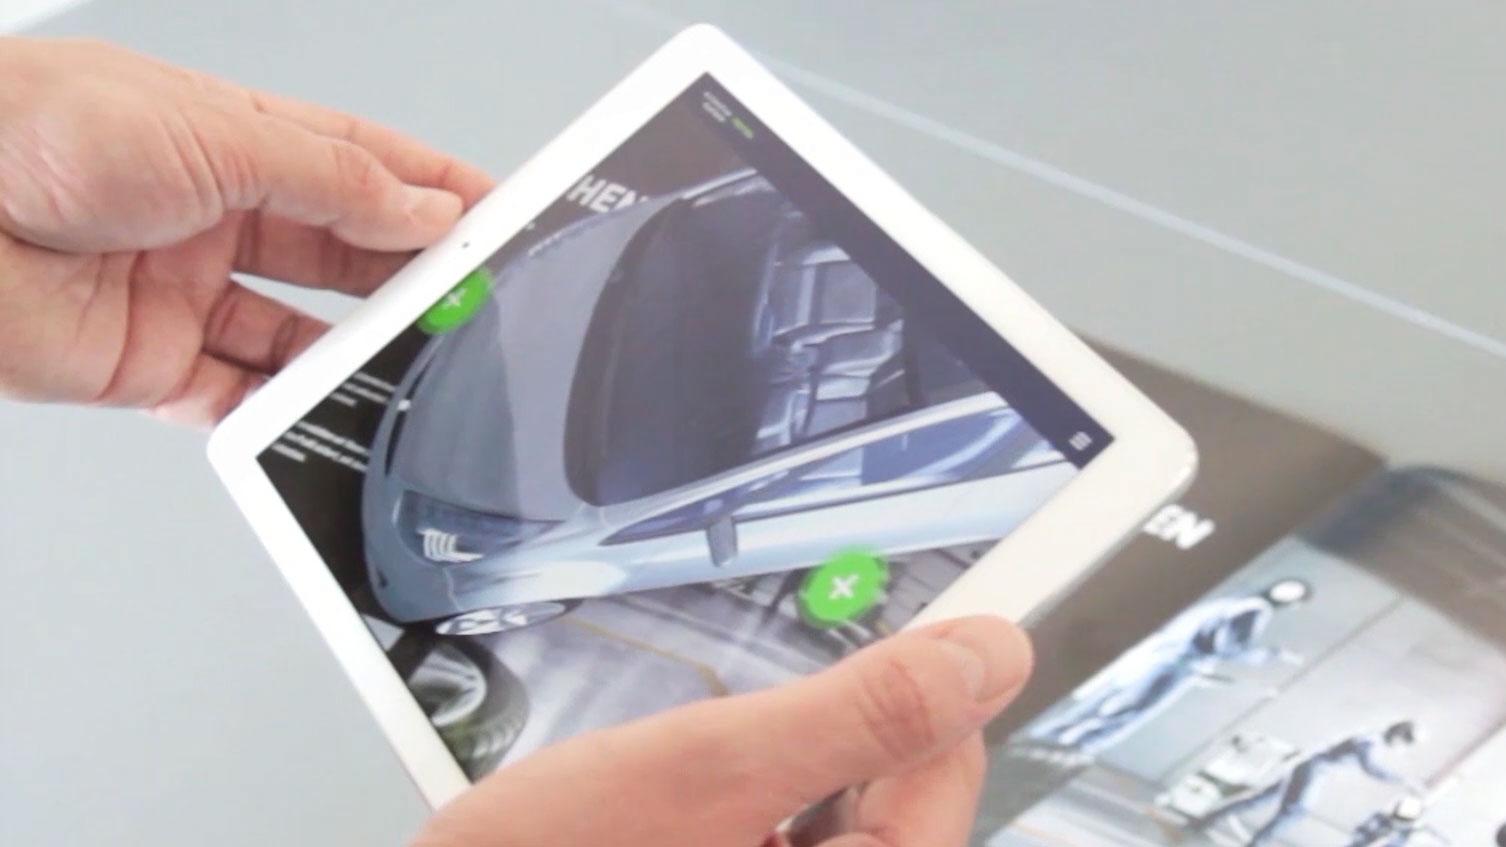 Printprodukte als 3D-Plattform